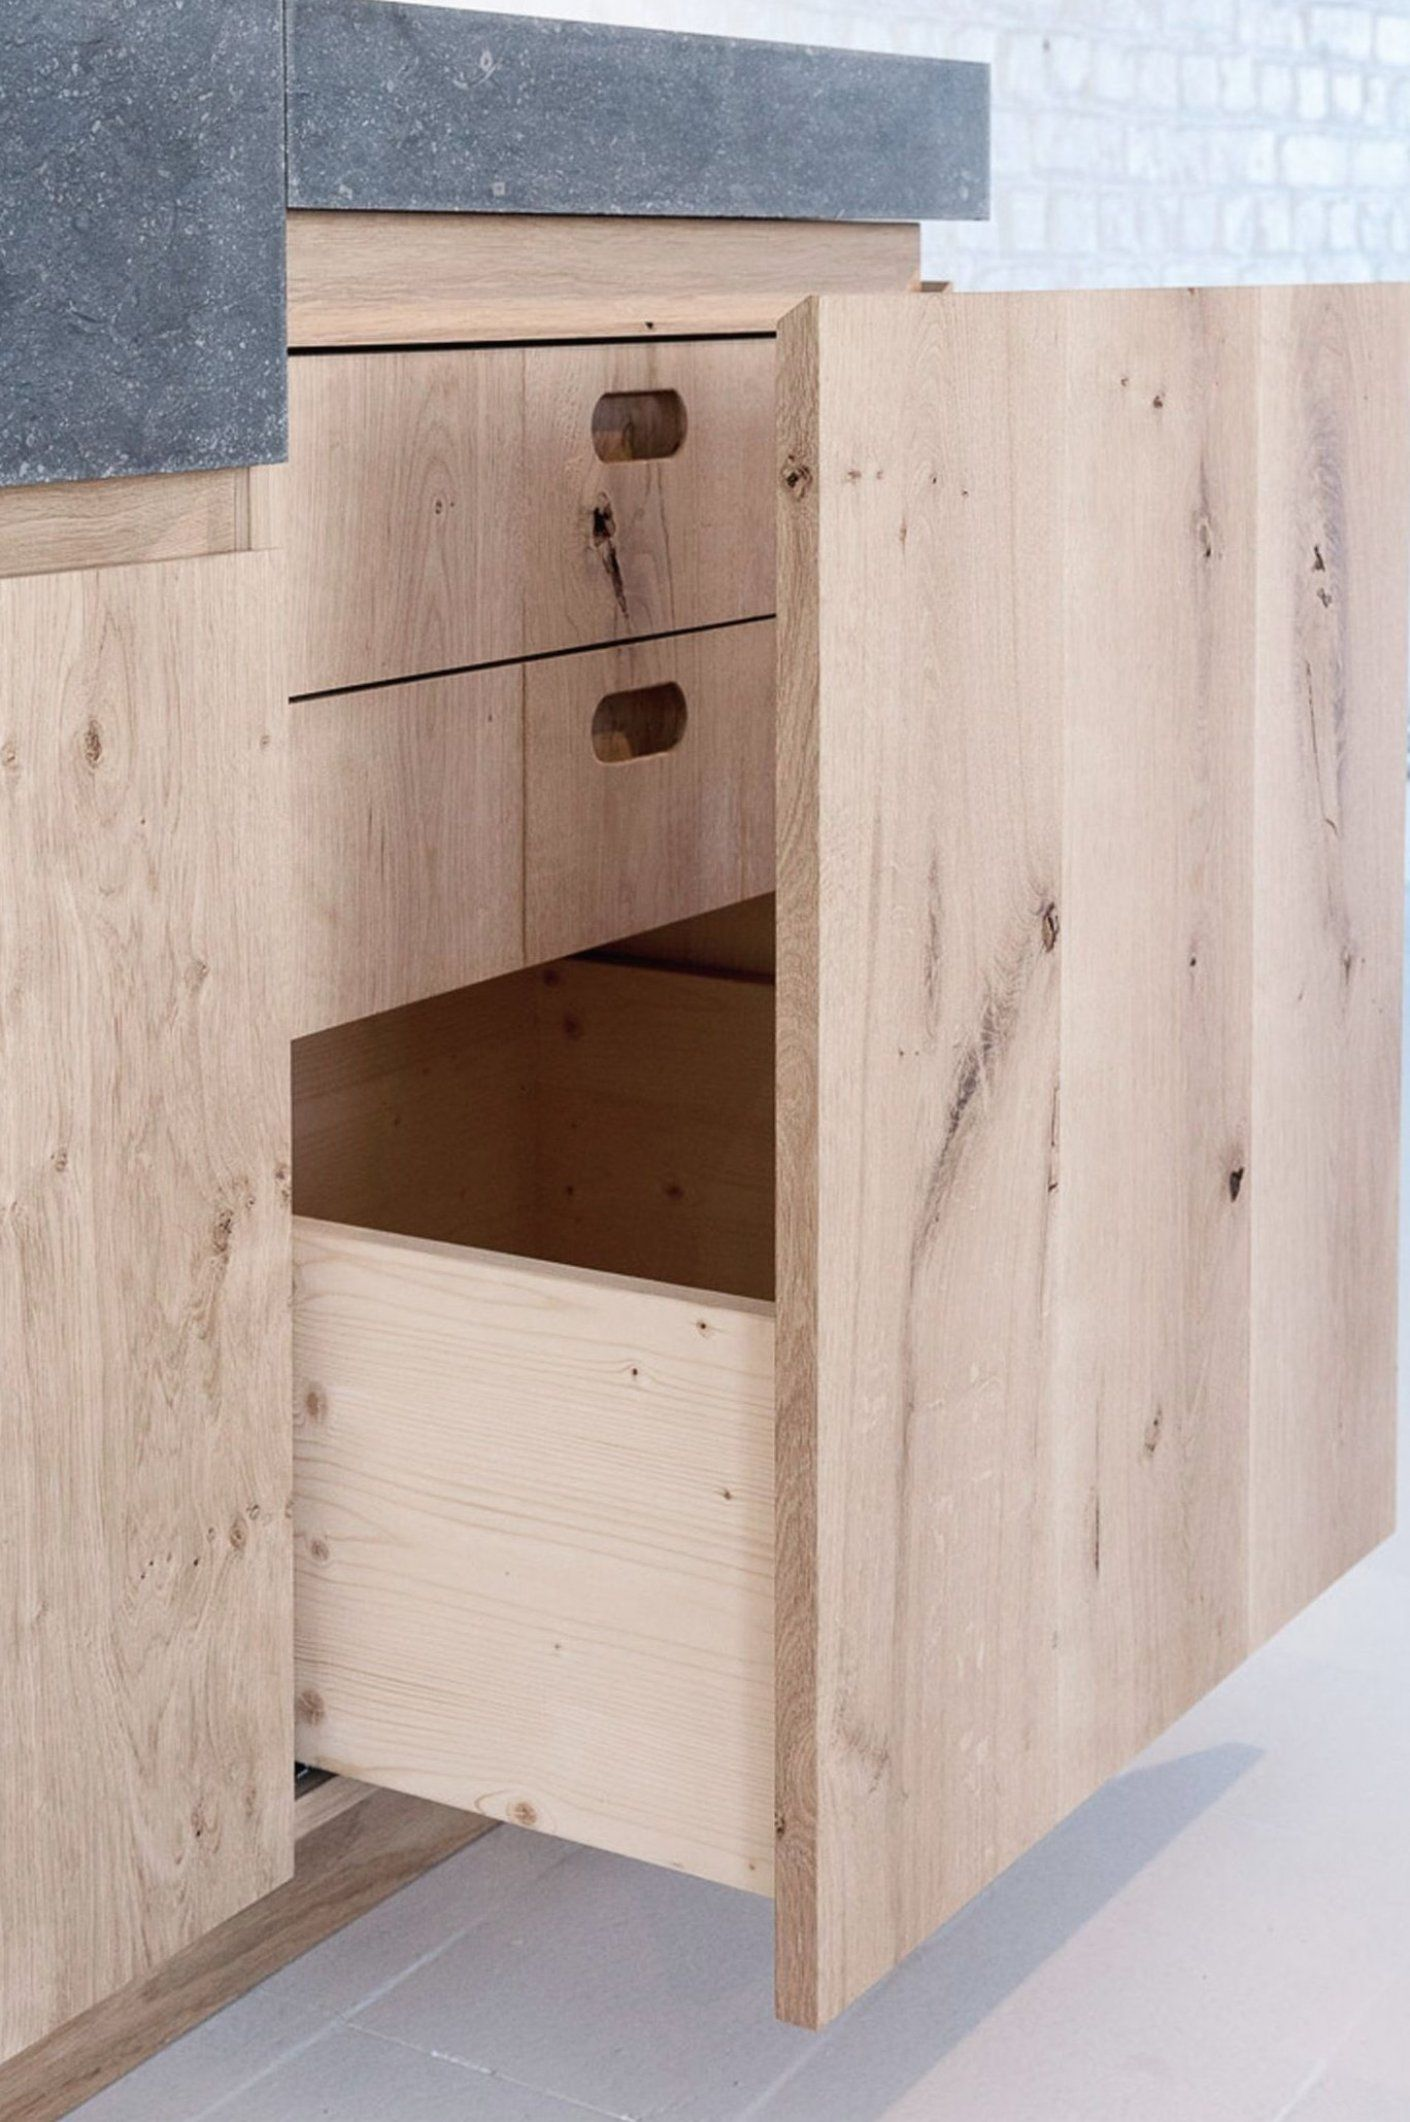 Newkitchencabinets Islandkitchendecor Pineapplekitchendecor Coffeekitchendecor In 2020 Light Wood Kitchens Wood Kitchen Cabinets Cabinet Design